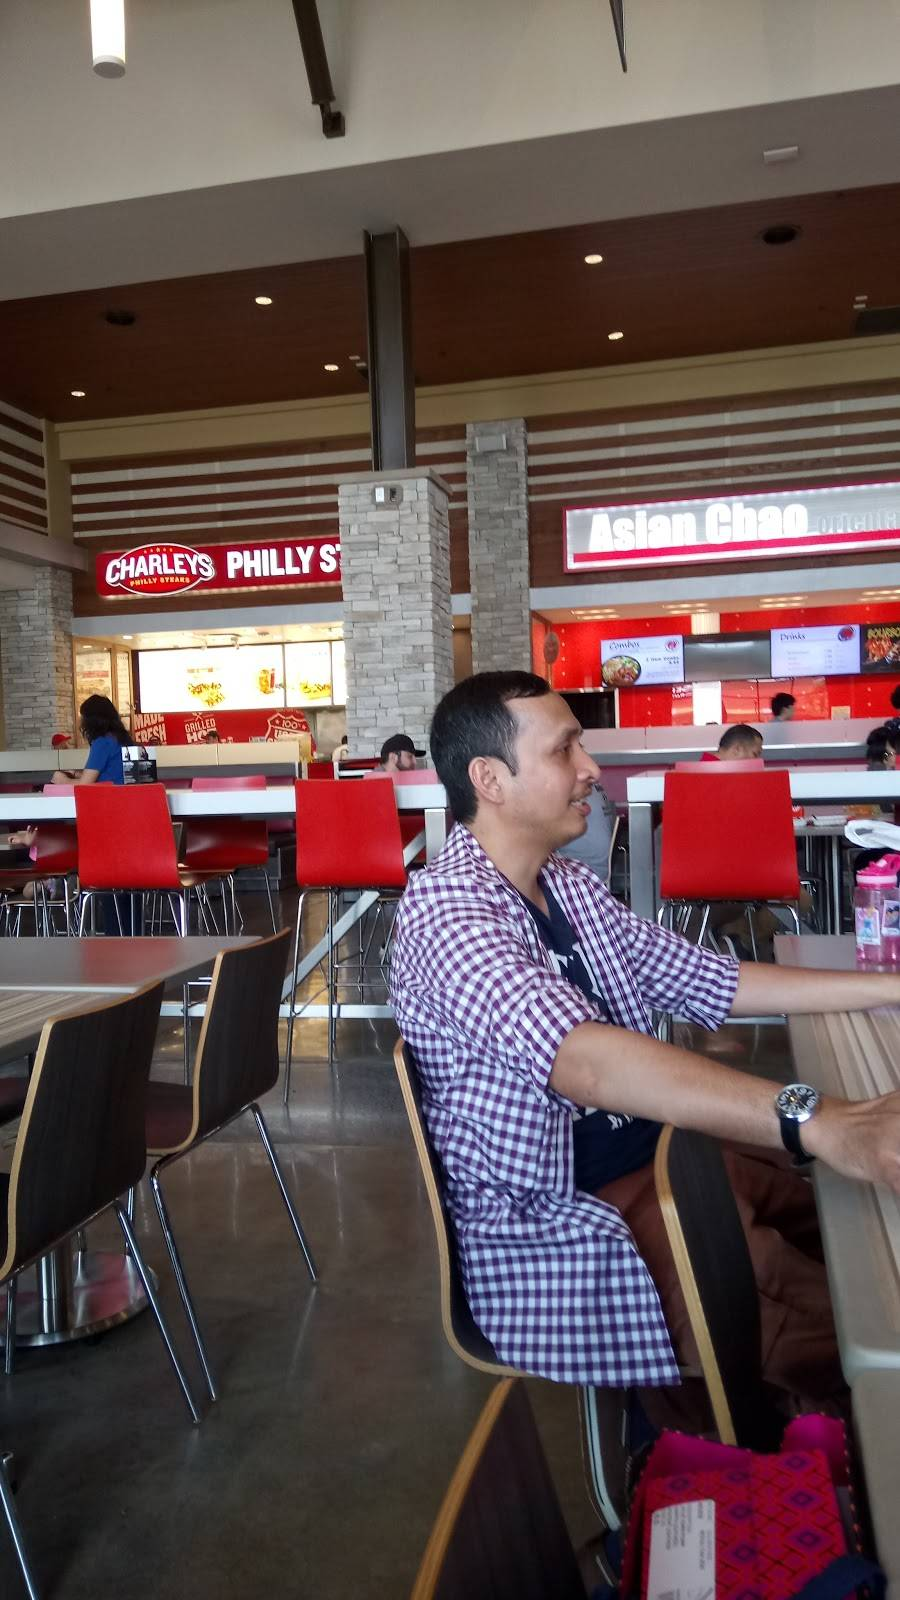 Charleys Philly Steaks | restaurant | 22705 Clarksburg Rd Suite 850, Clarksburg, MD 20871, USA | 6465410288 OR +1 646-541-0288